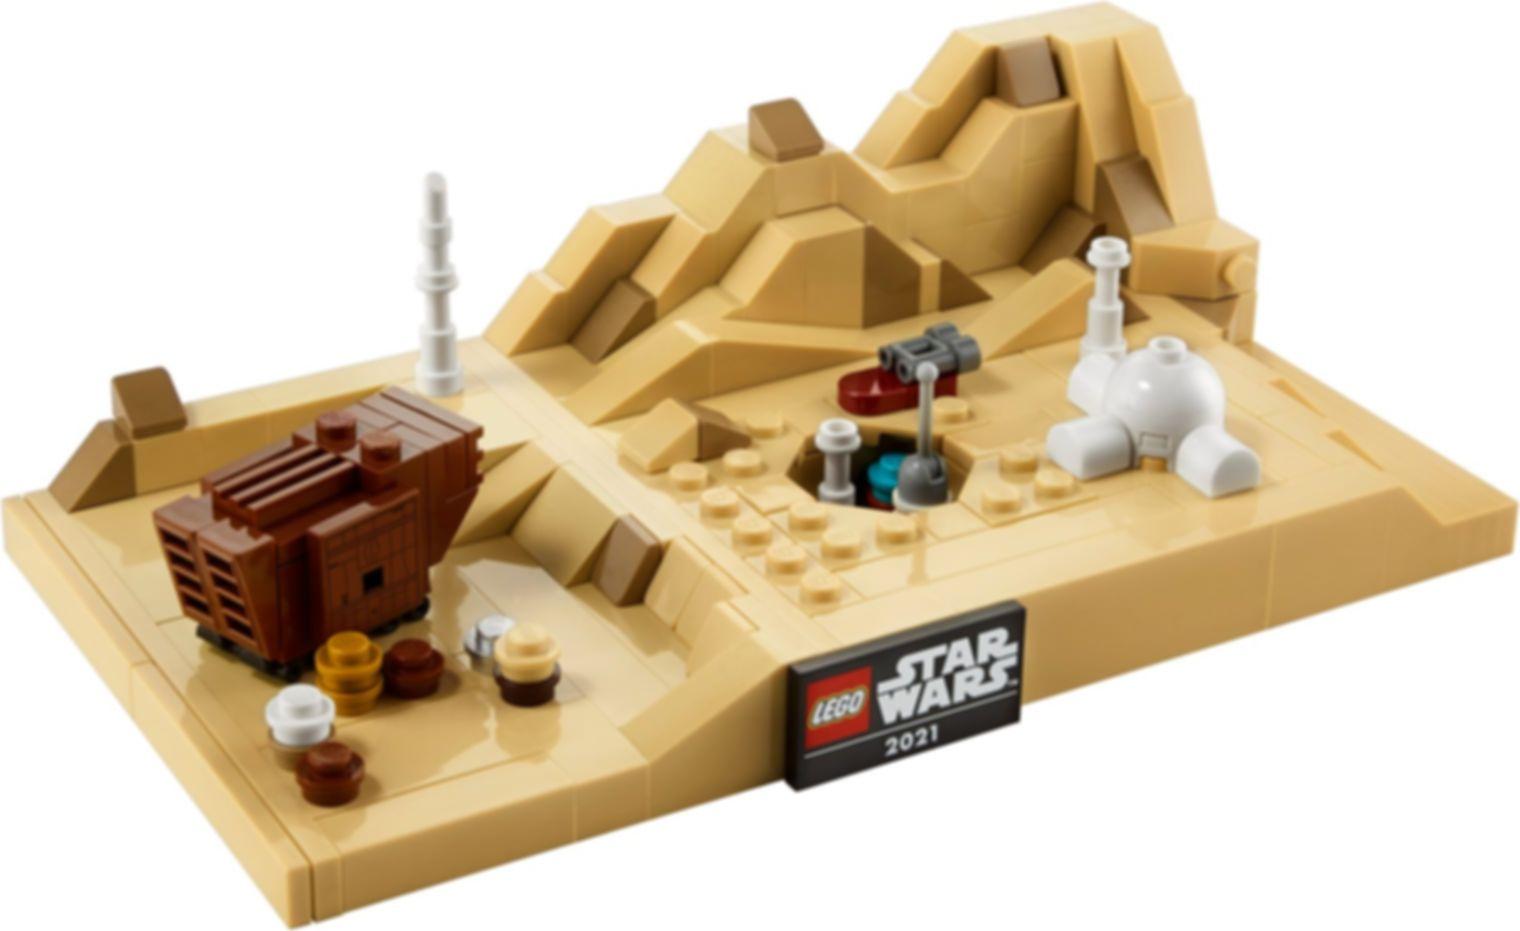 LEGO® Star Wars Tatooine Homestead components